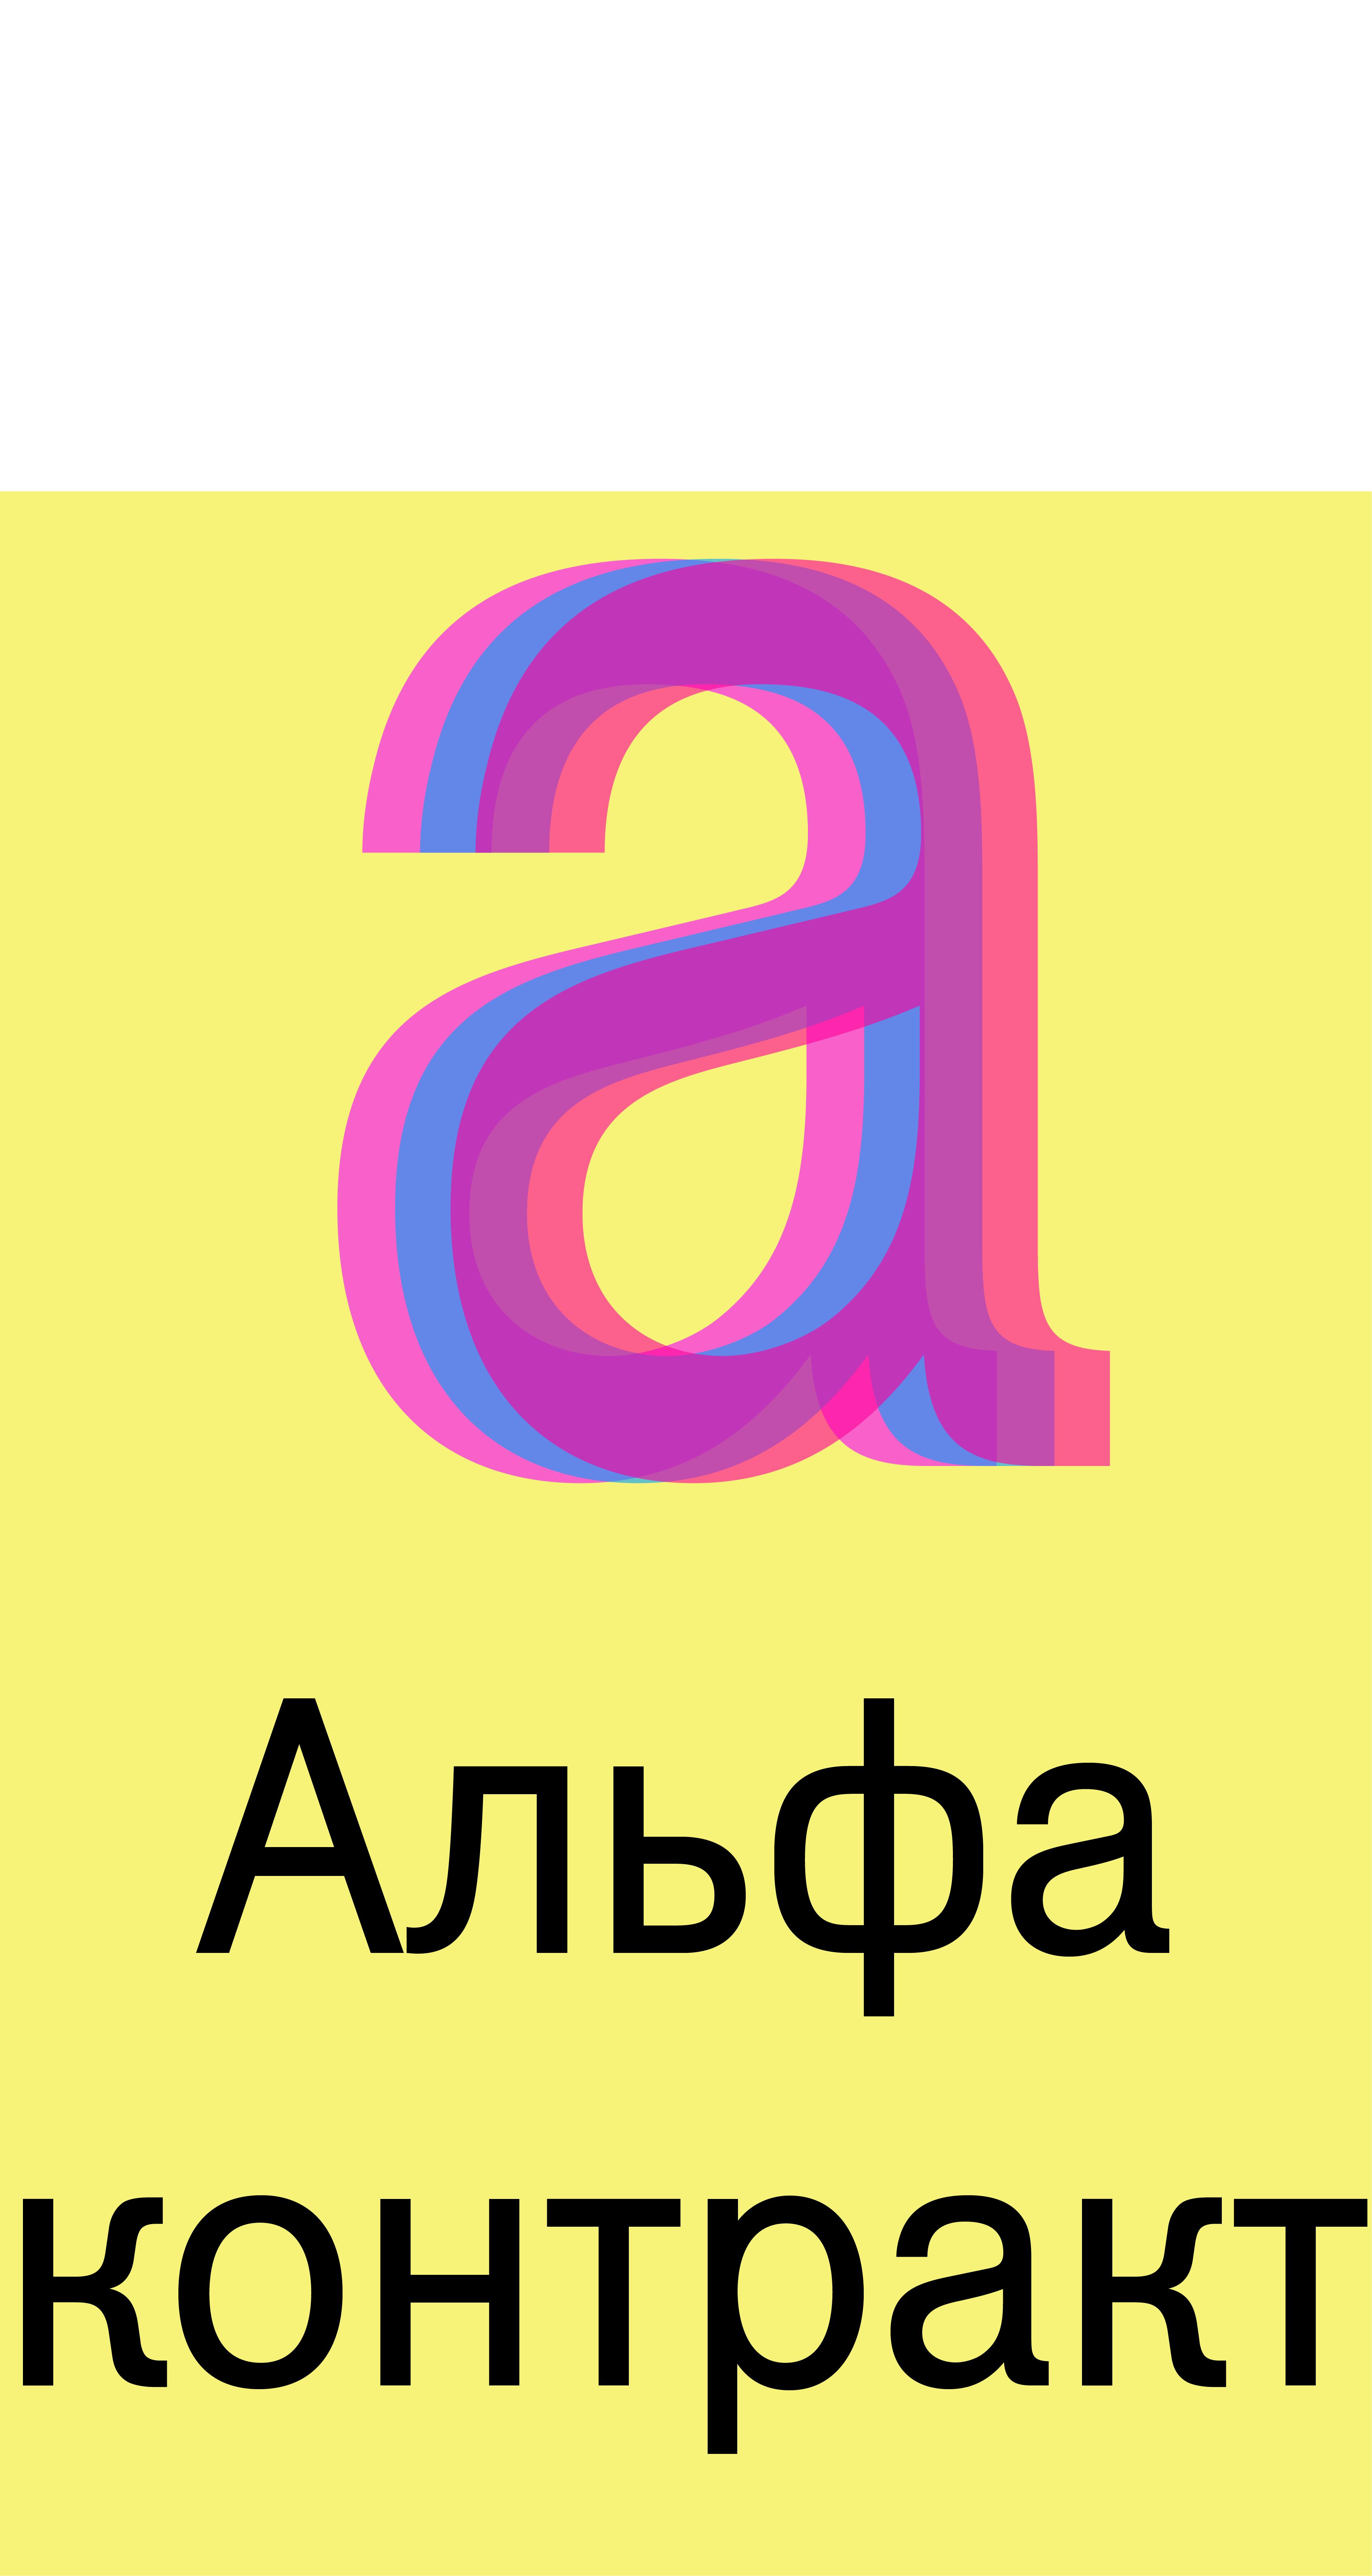 Дизайнер для разработки логотипа компании фото f_8515bf9a151547fc.png